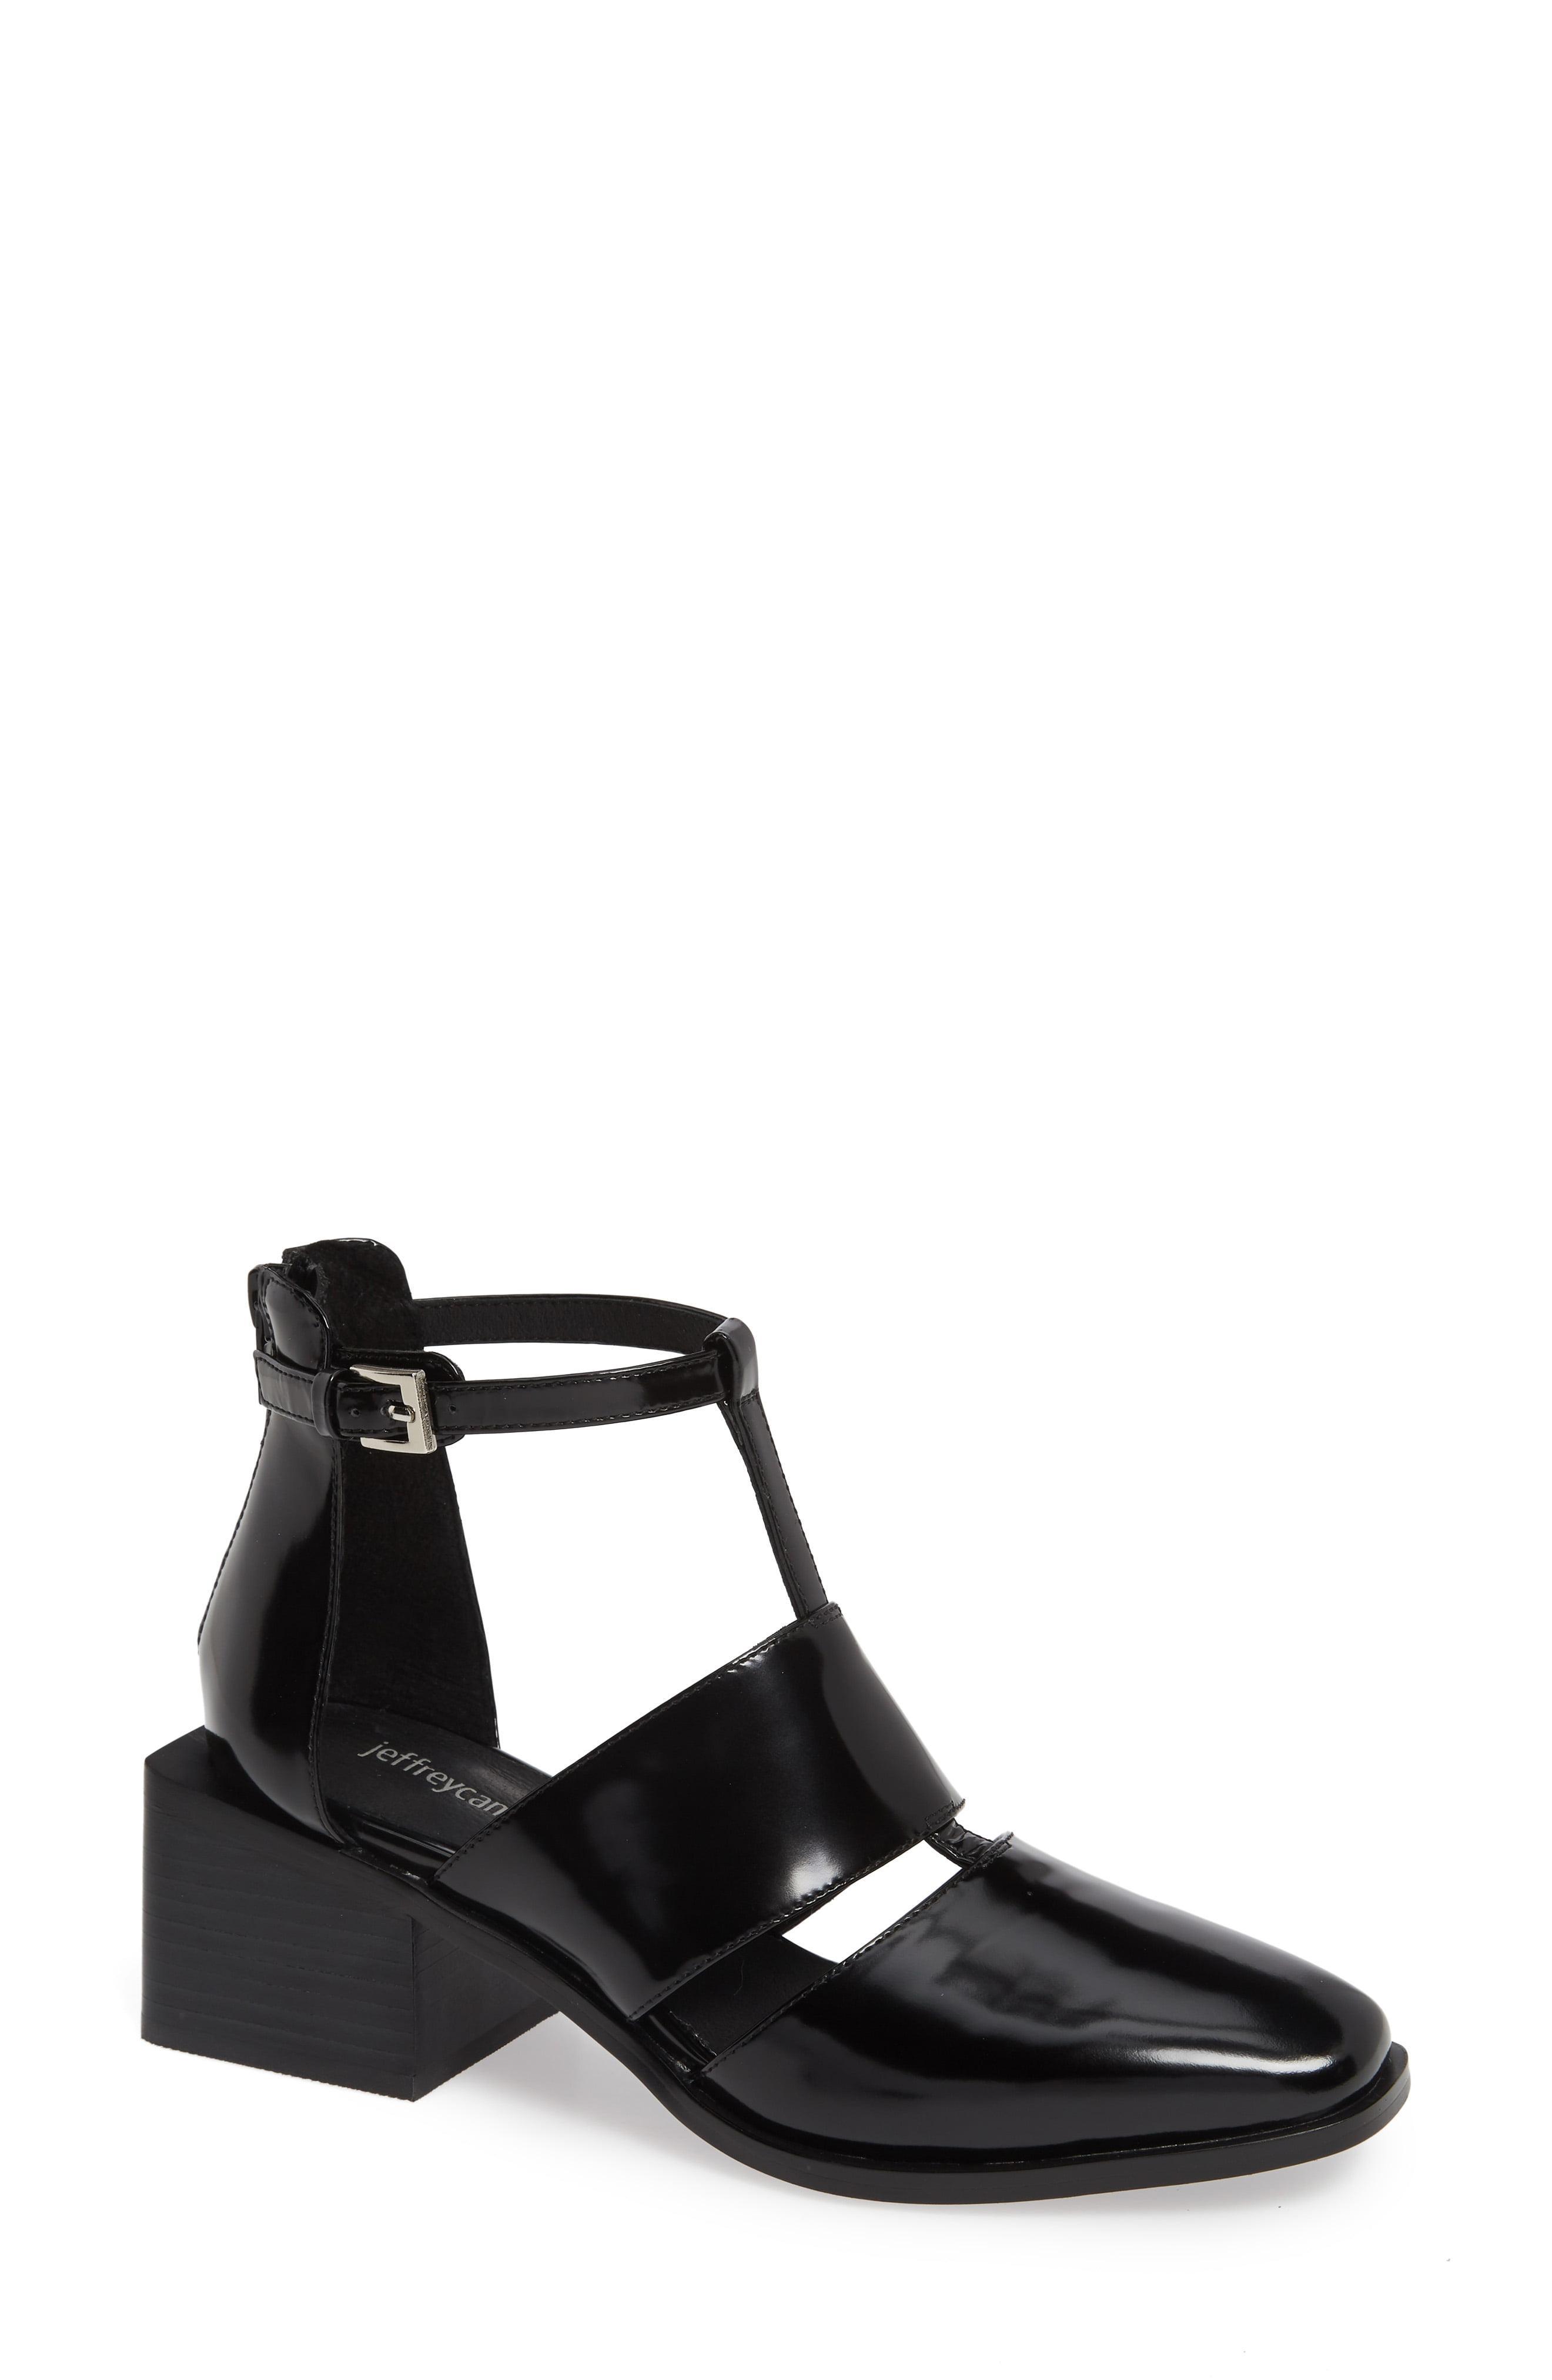 edc5b63d8f0 Lyst - Jeffrey Campbell Douglas Block Heel Pump in Black